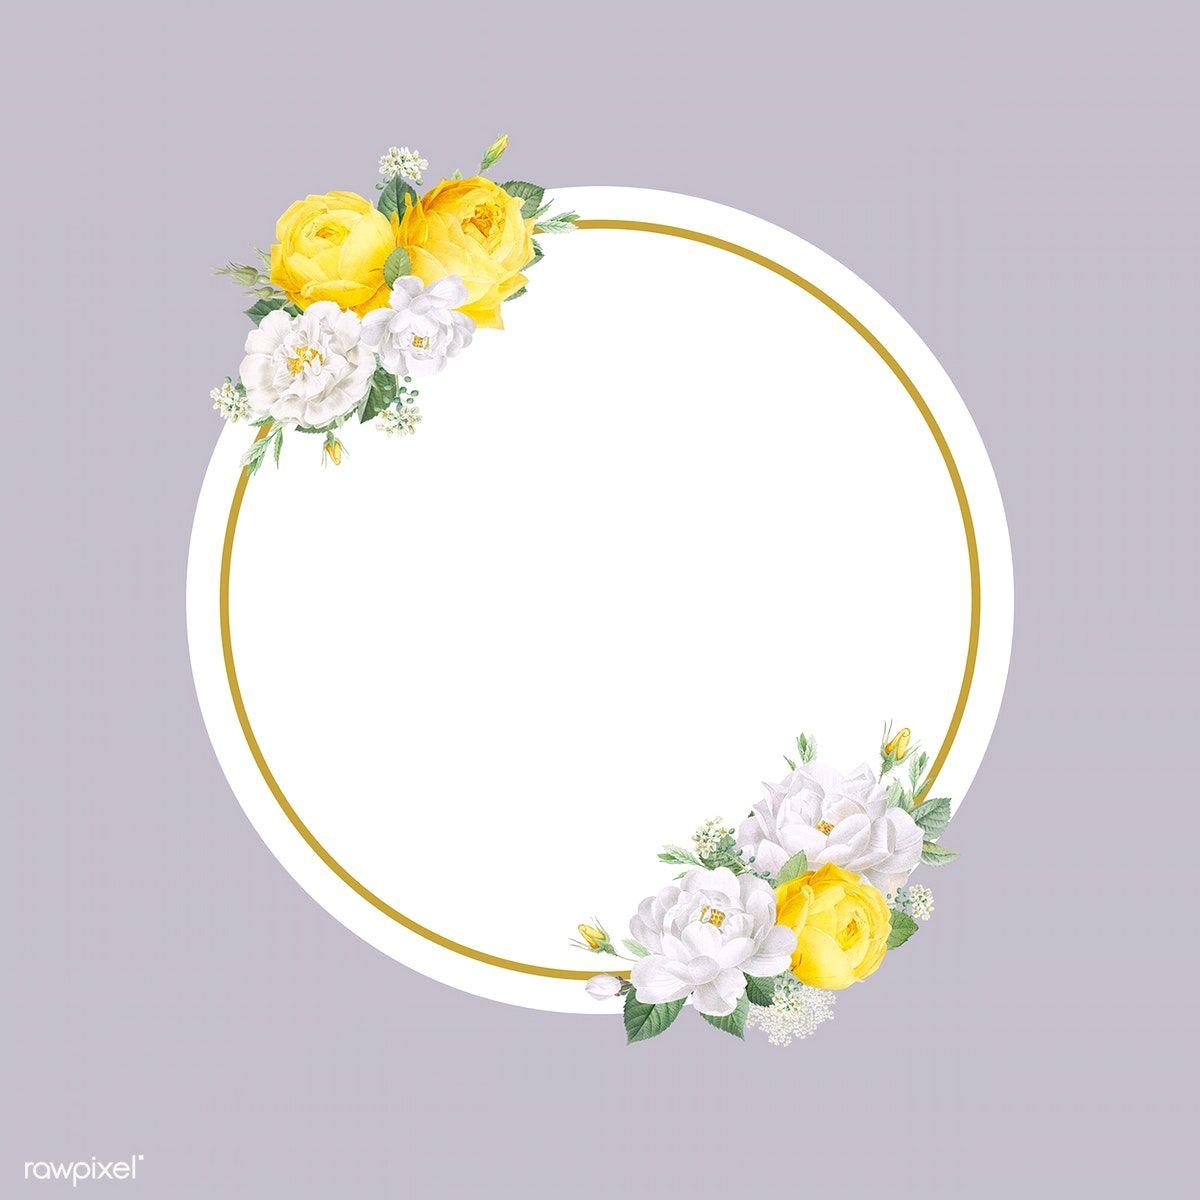 Download Premium Illustration Of Floral Wedding Invitation Mockup Floral Wedding Invitations Invitation Mockup Floral Border Design